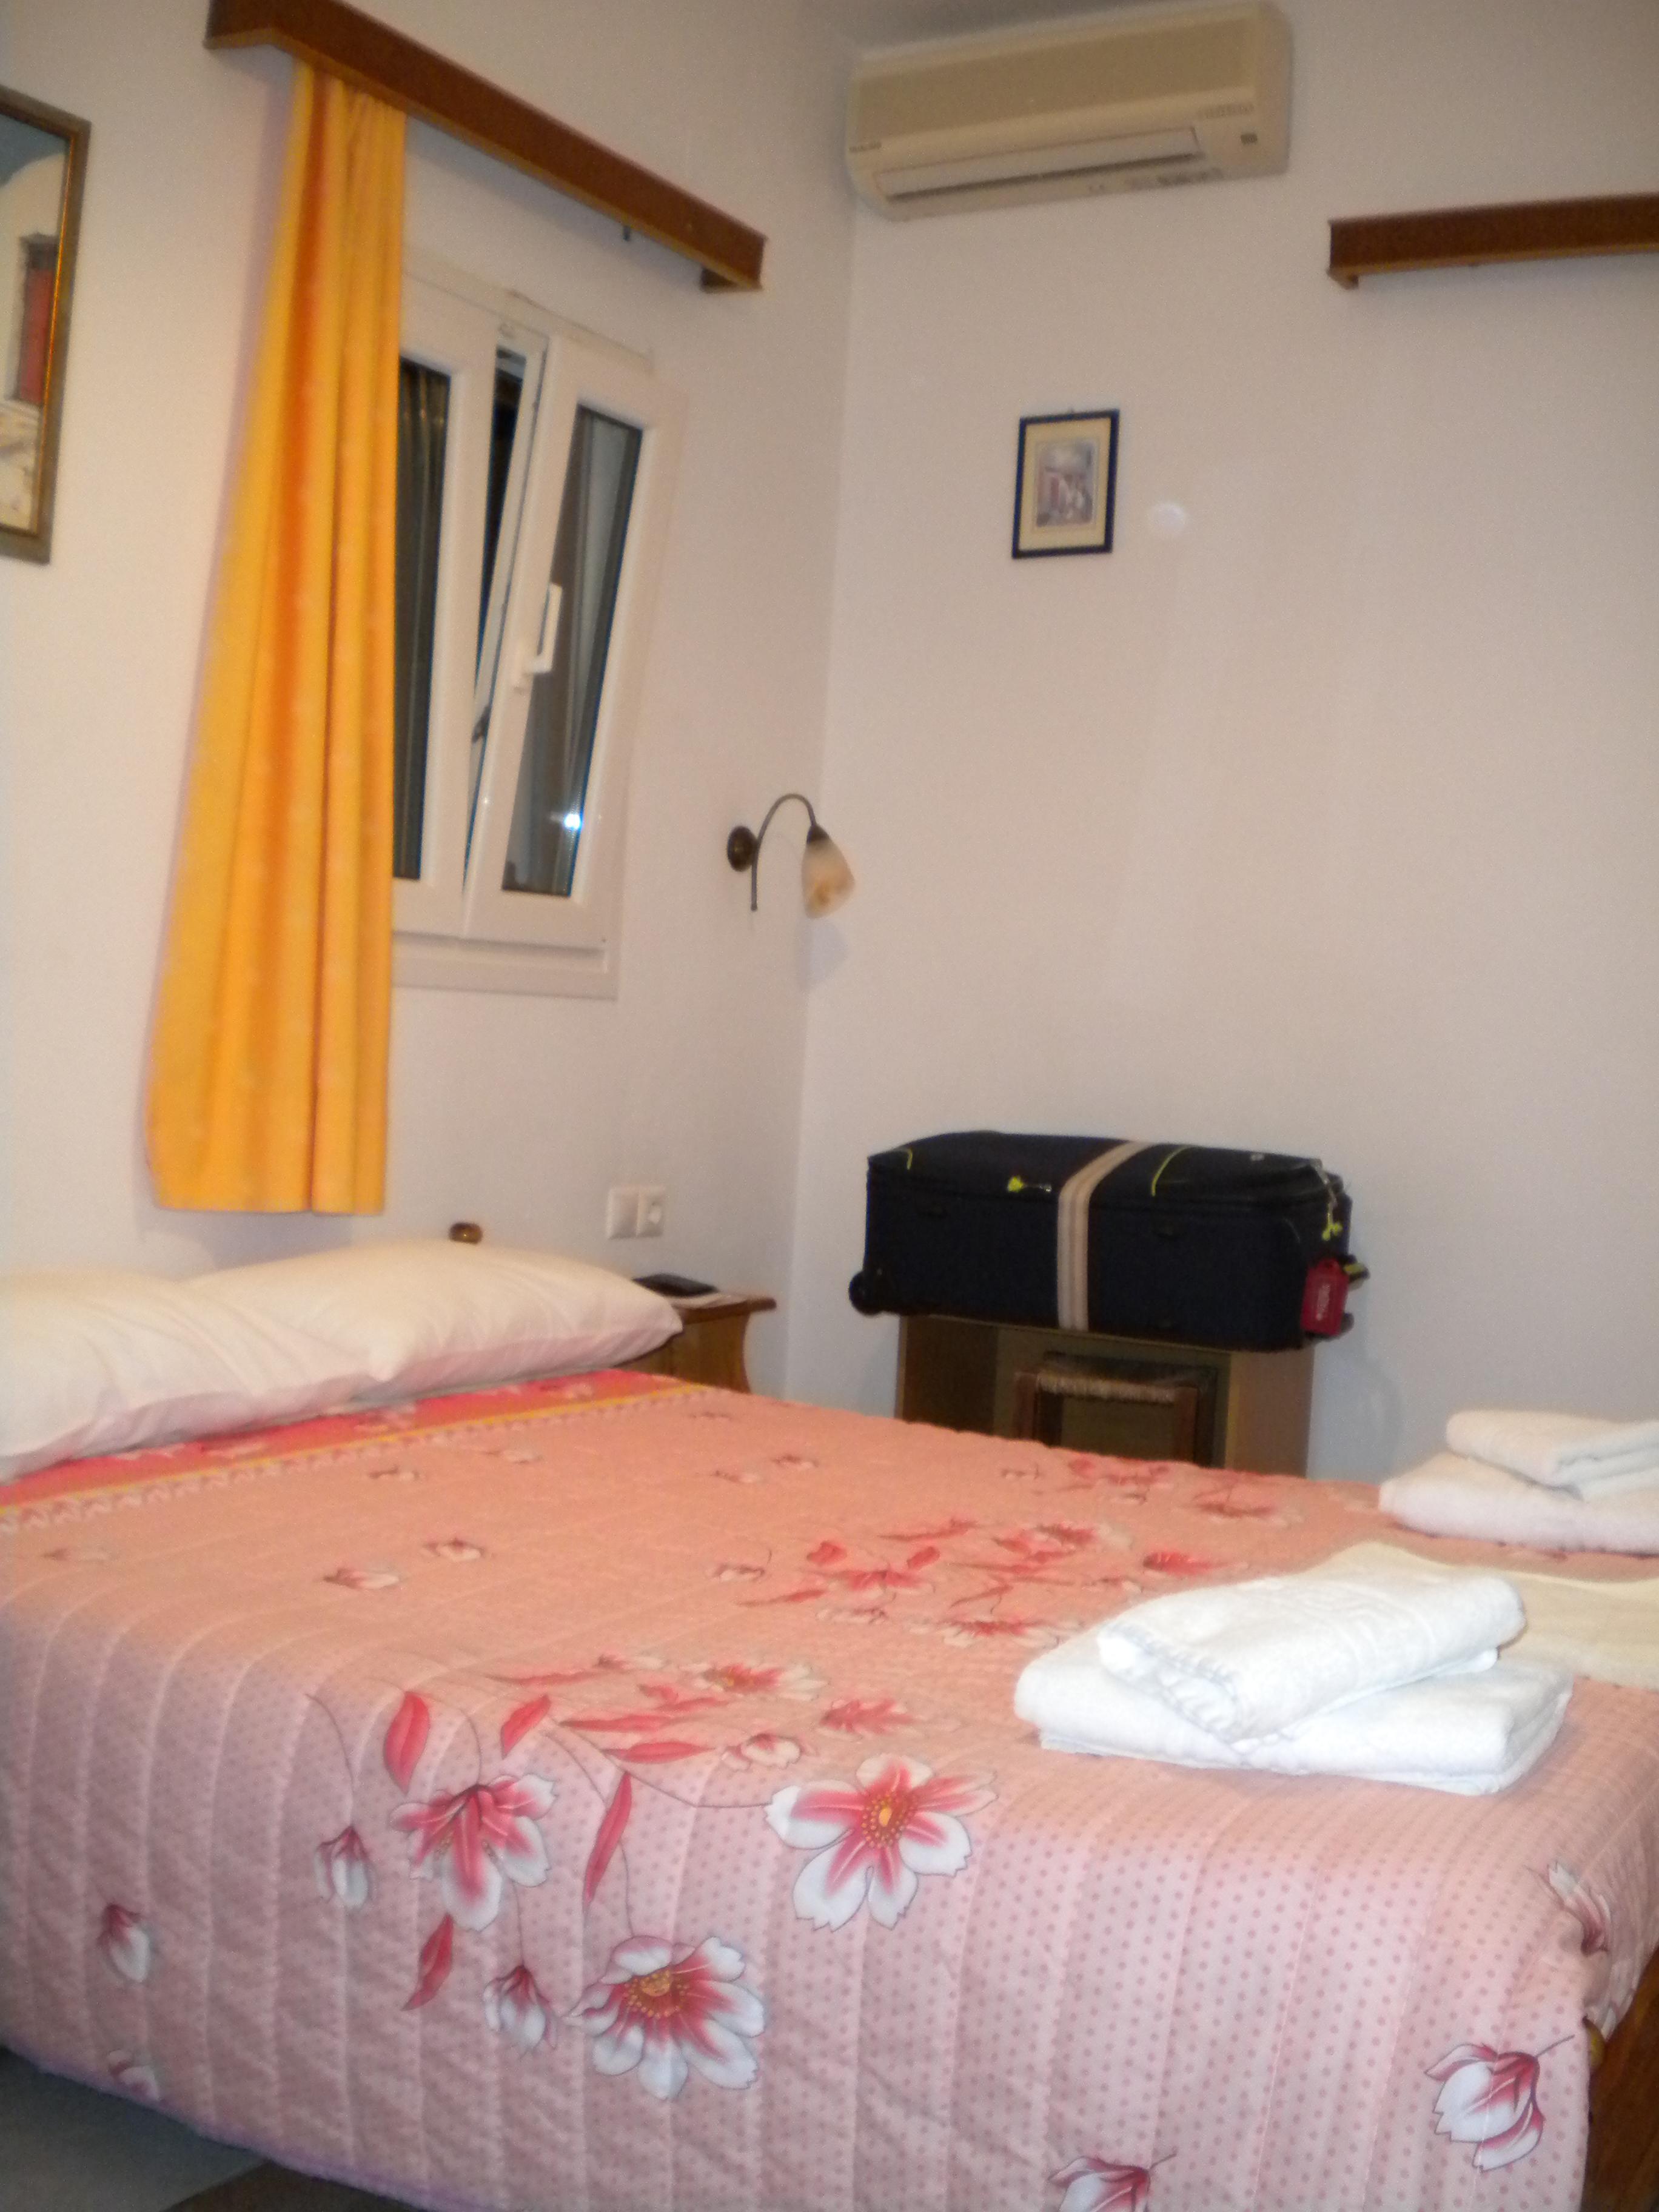 The Dina's Mykonos Hotel Rooms